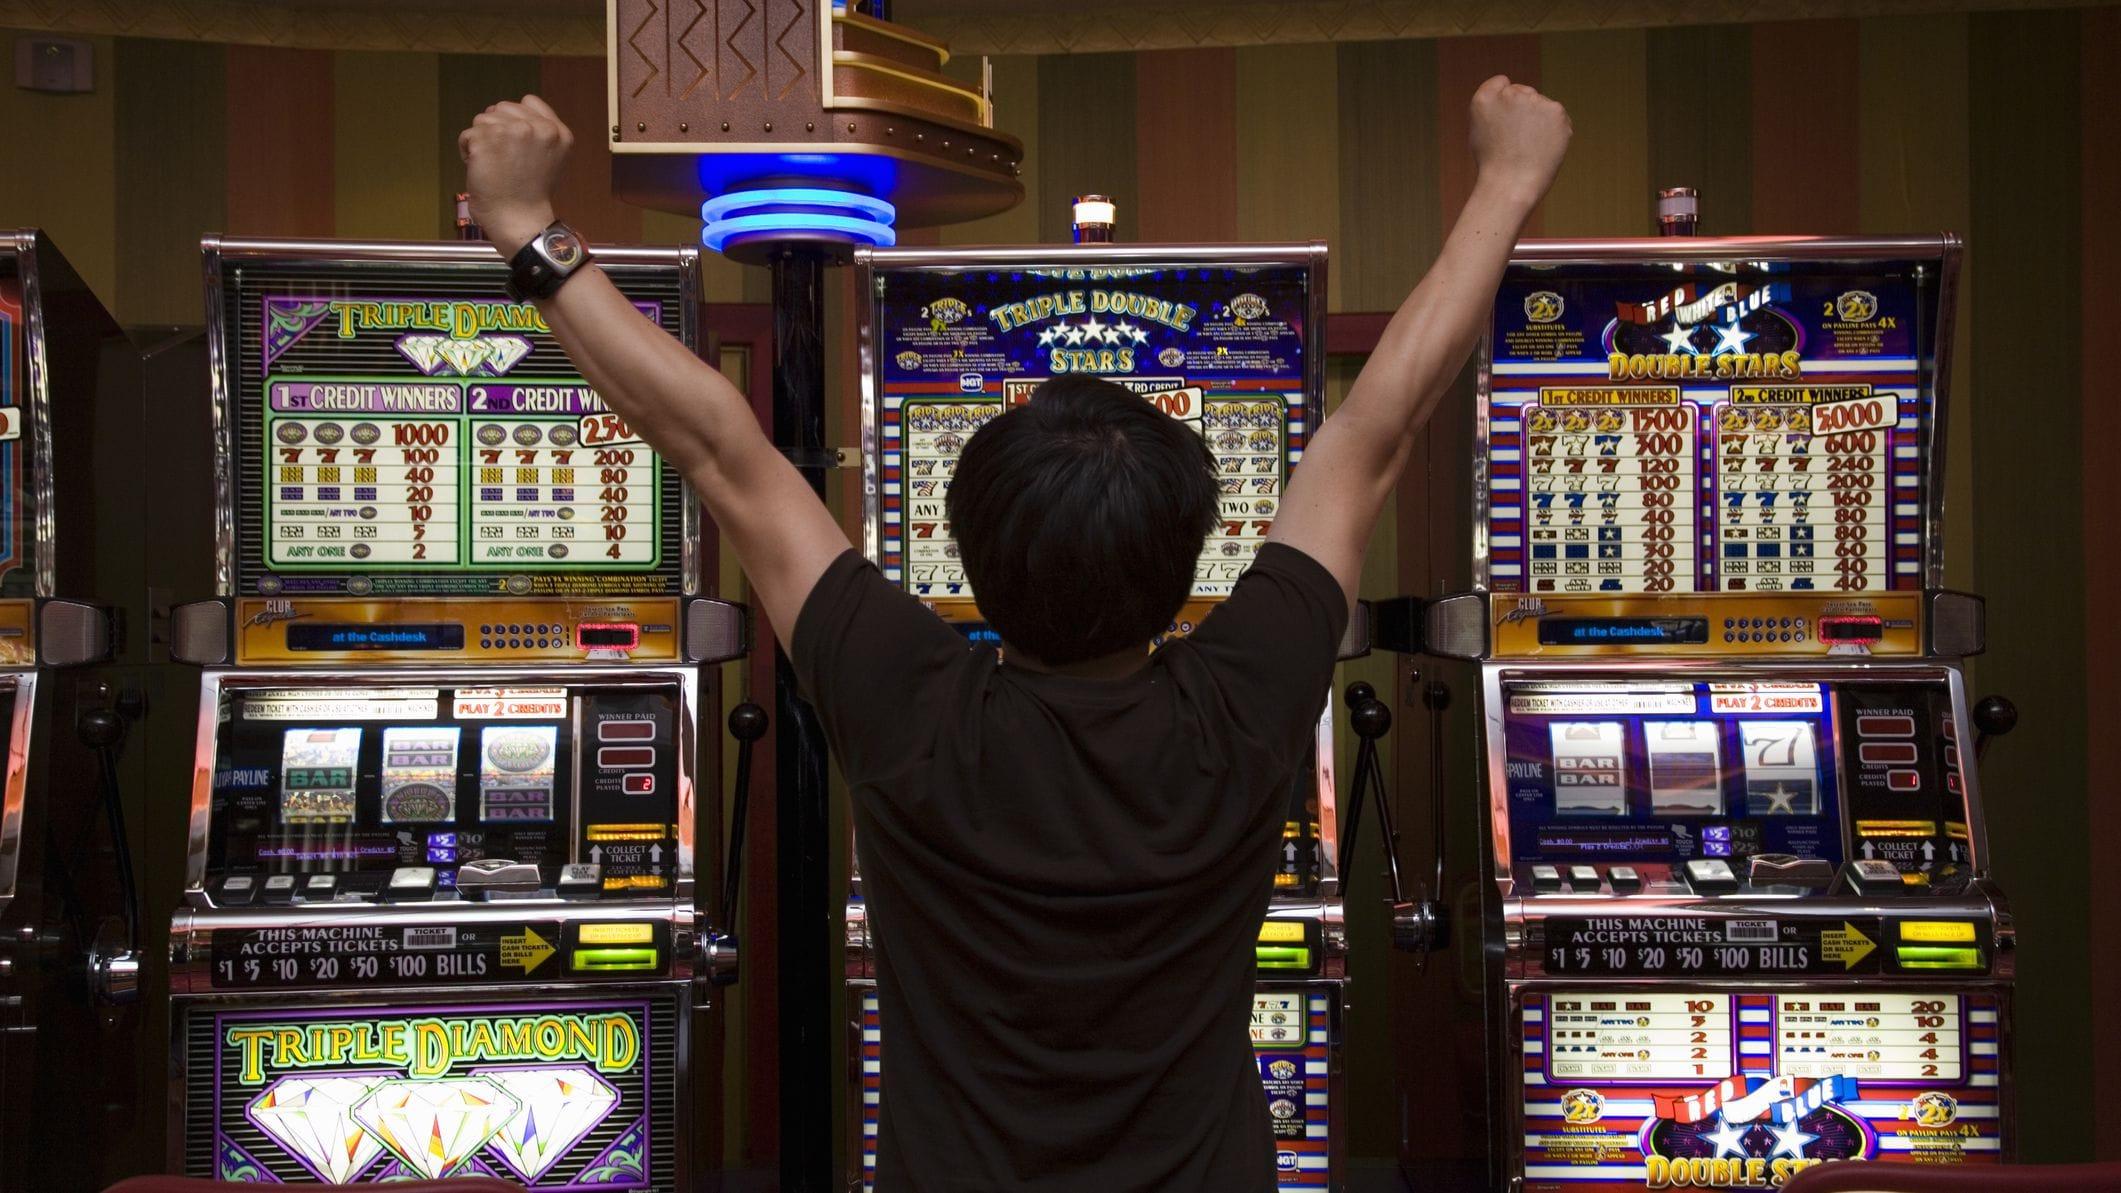 Classic Video Slots Machines